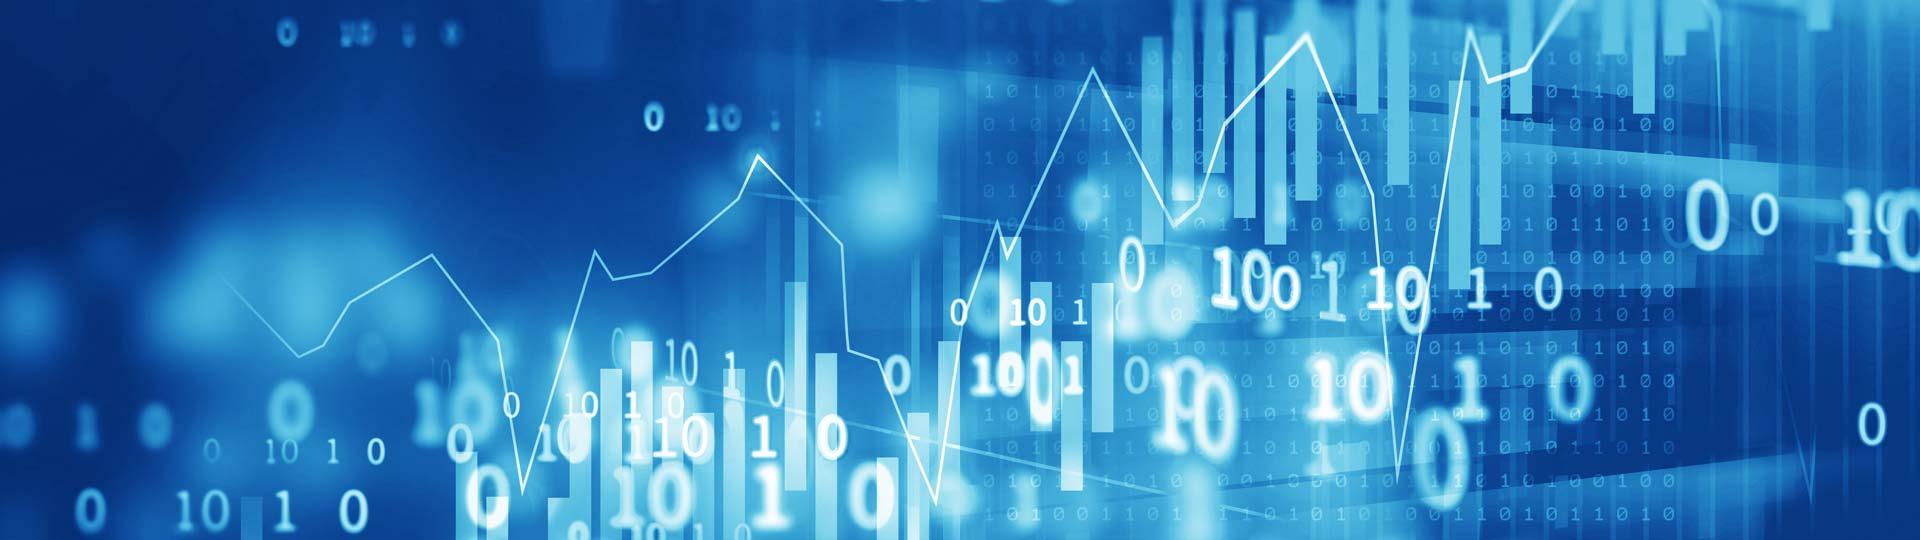 Start Pdv Fscom 1 0 Digital Transformation According To Your Needs